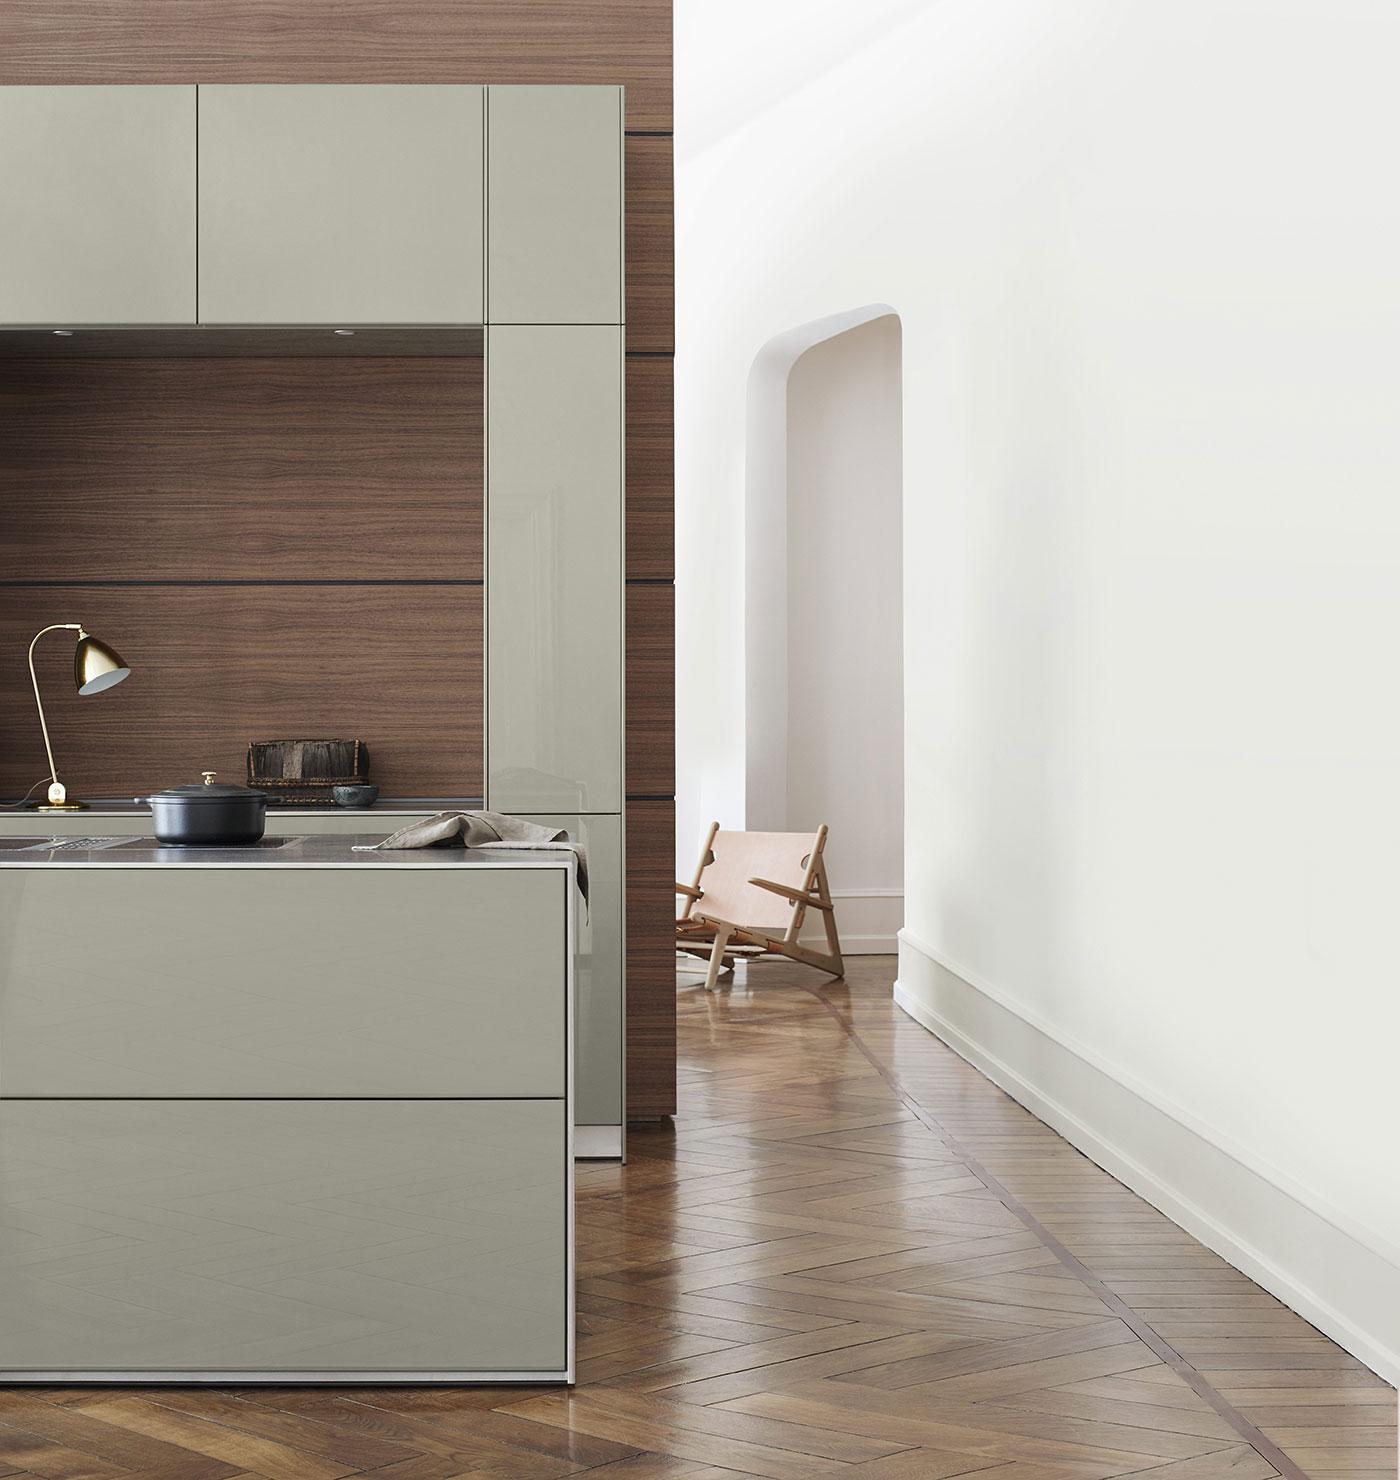 Obegi Home Bulthaup Kitchens B3 DK 2015 2387 Step2 SRGB